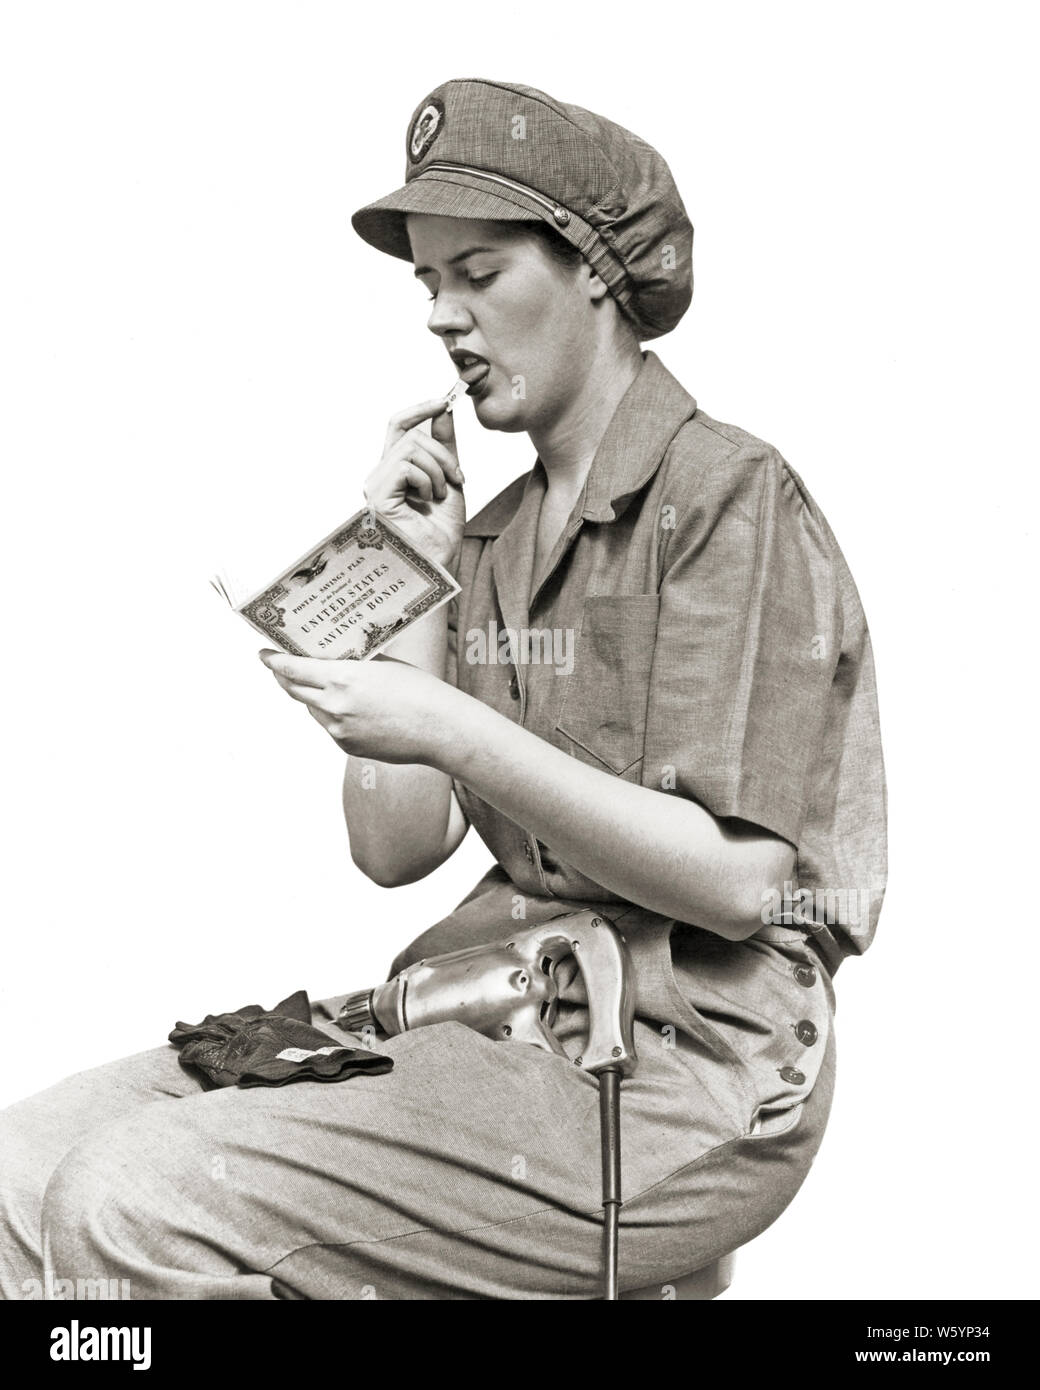 41e603b4e4 Women Factory World War Ii Stock Photos & Women Factory World War Ii ...